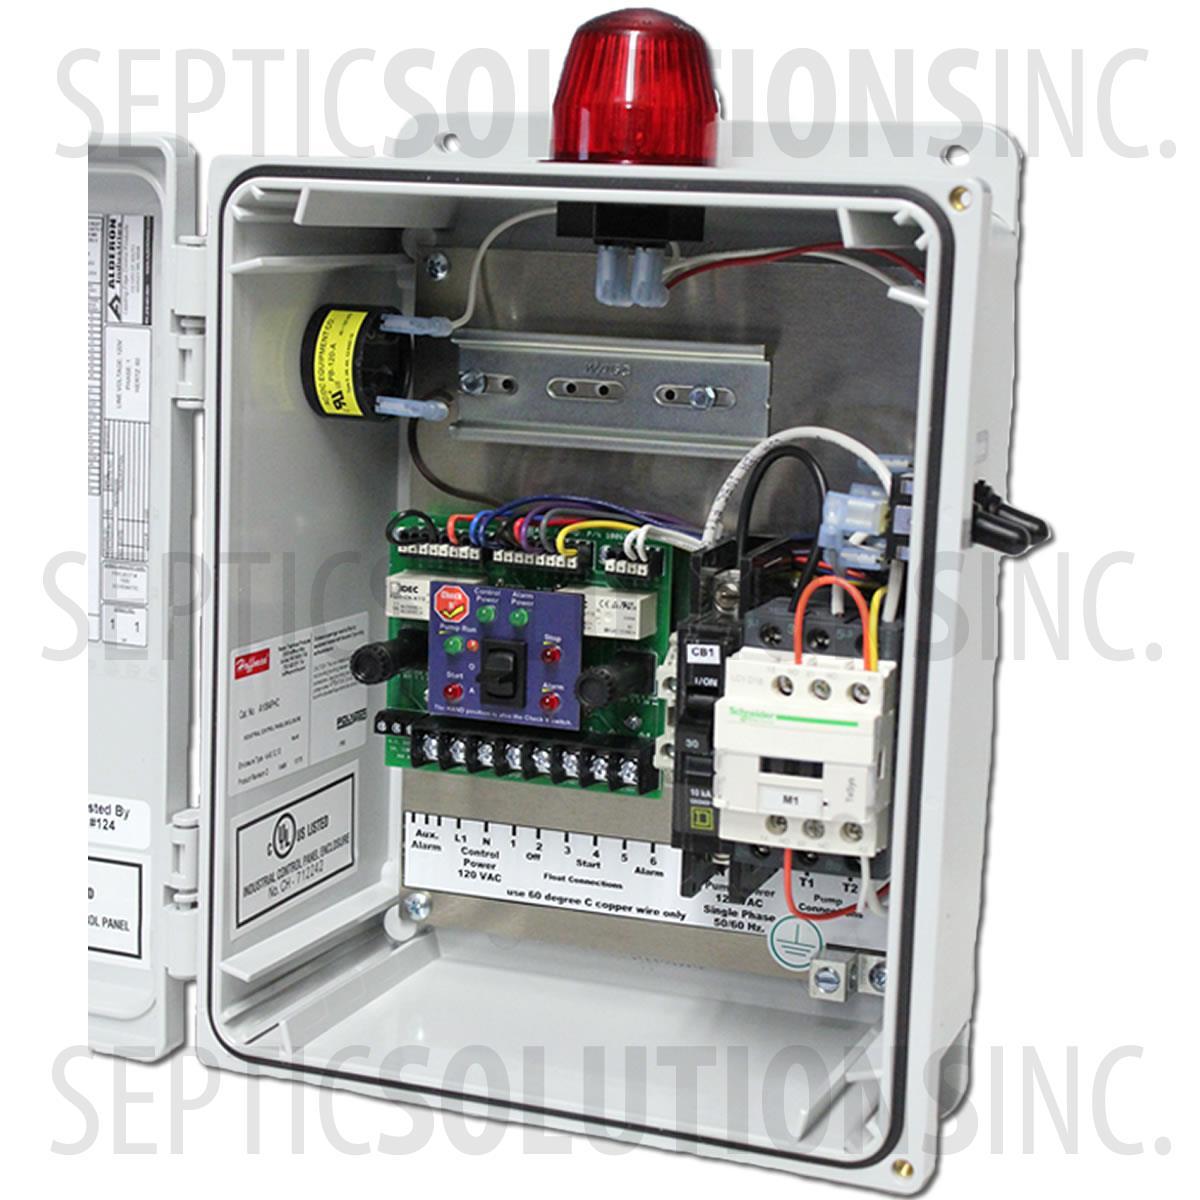 1001_1?w=600 alderon check it simplex pump station control panel free shipping duplex pump control panel wiring diagram at gsmportal.co